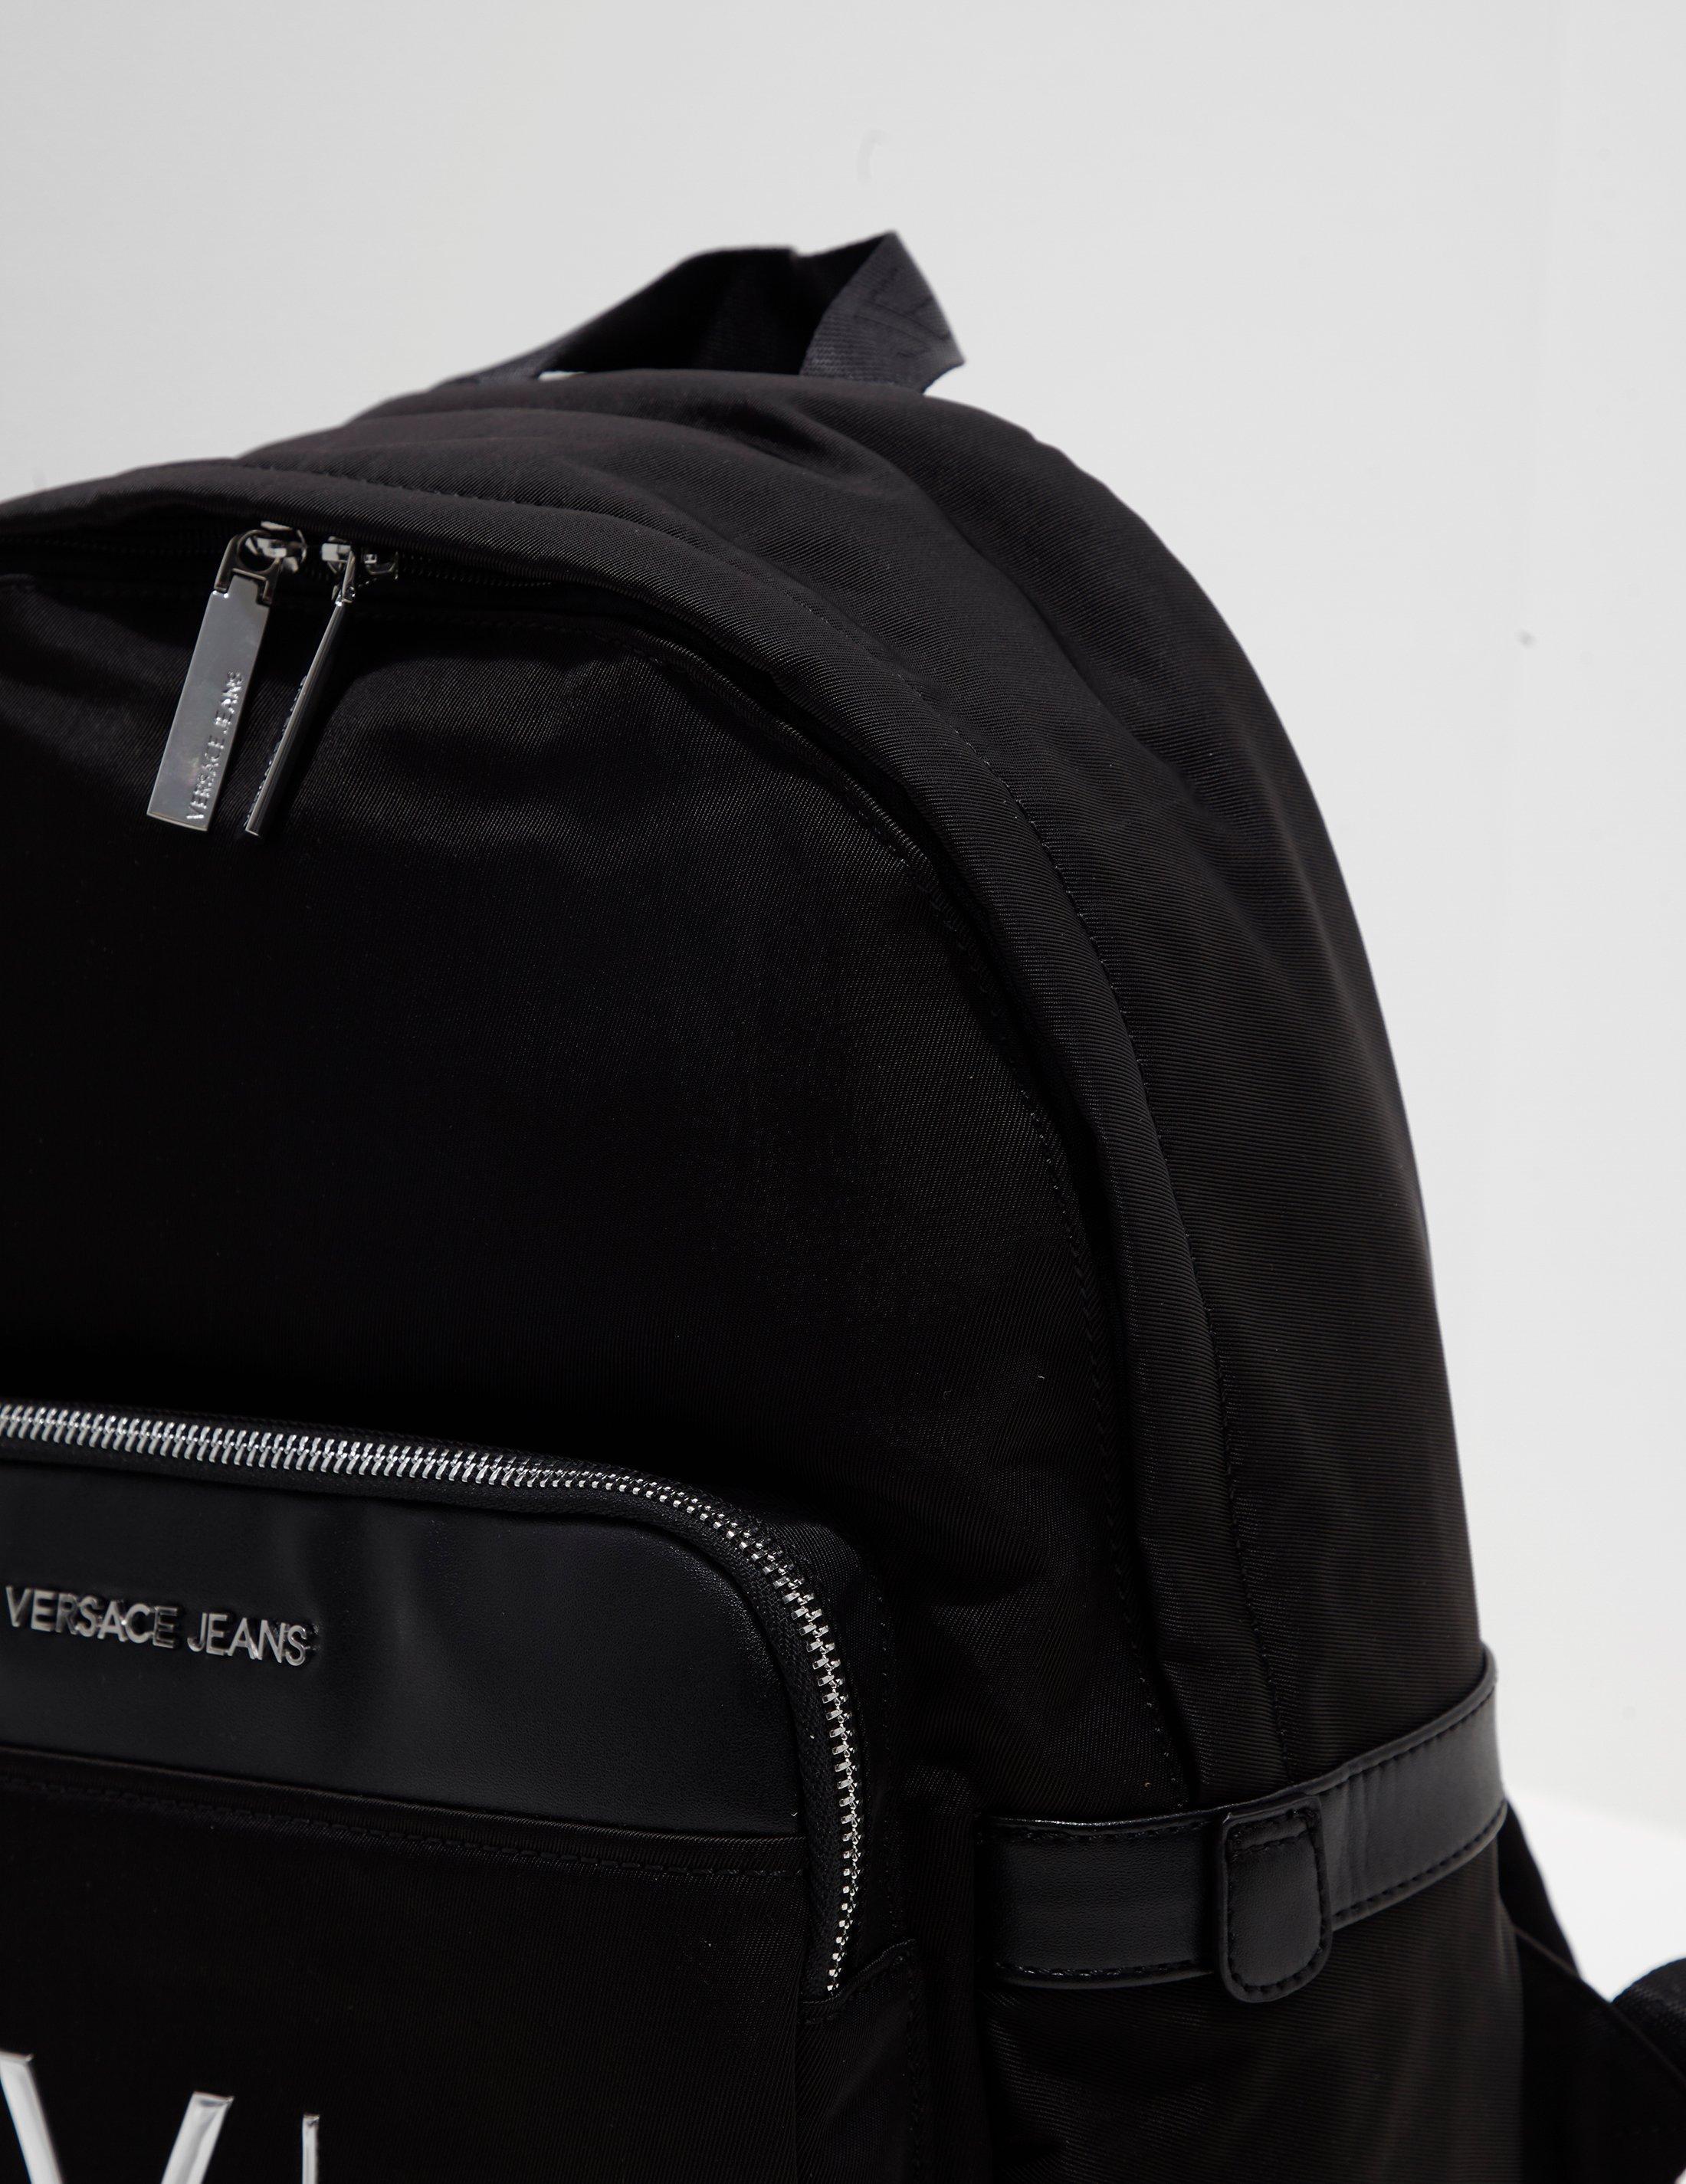 200a0f479634 Lyst - Versace Jeans Mens Linea Logo Backpack Black in Black for Men